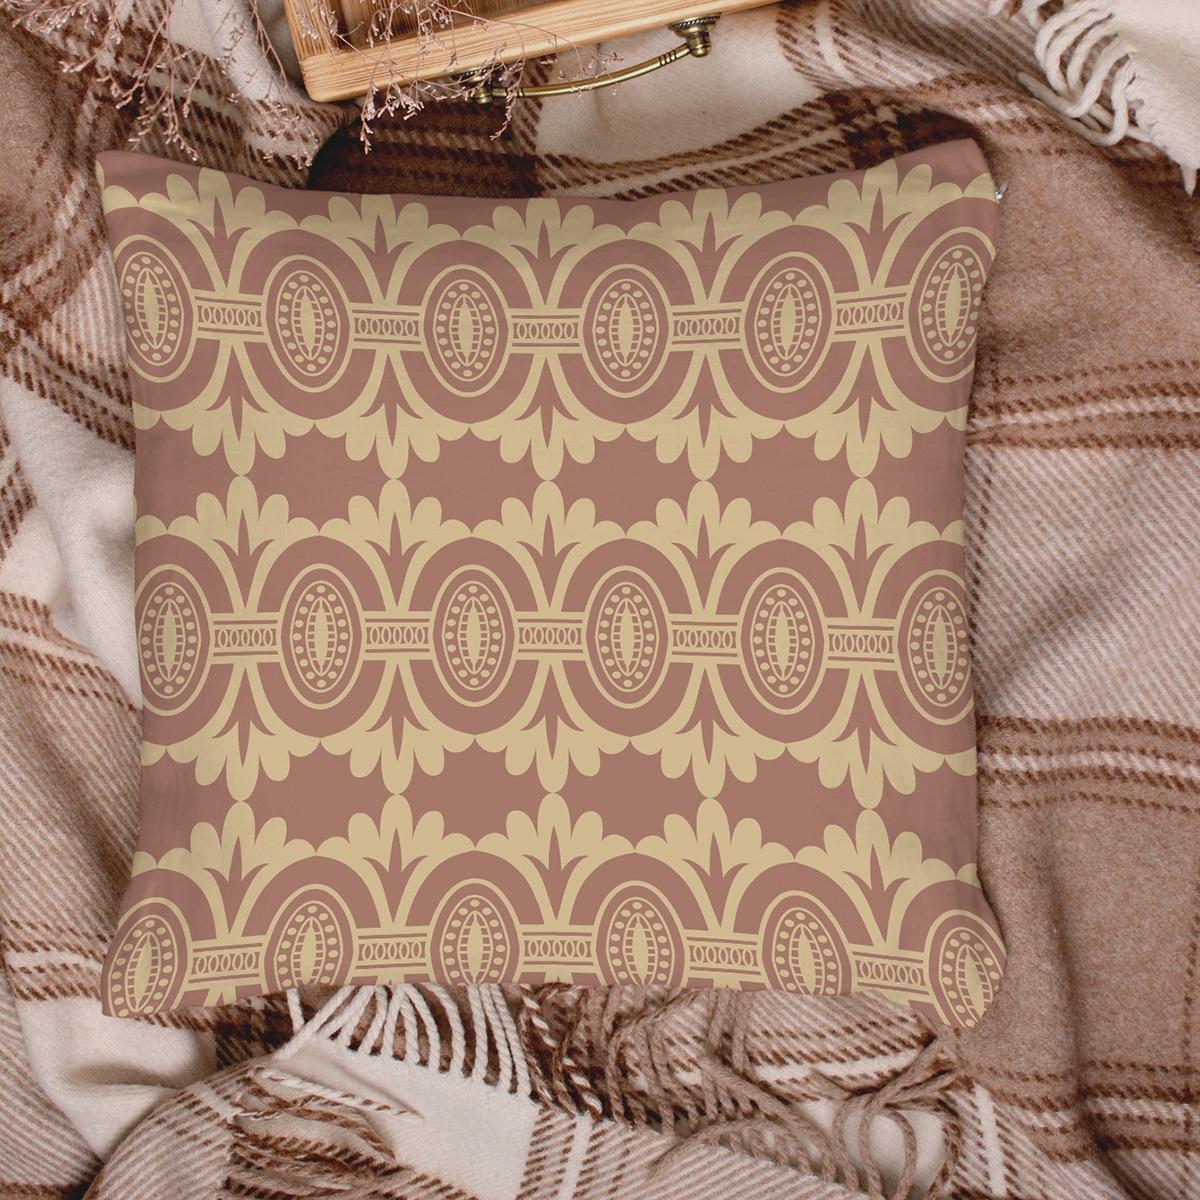 Чехол для подушки с винтажным узором без наполнителя фото